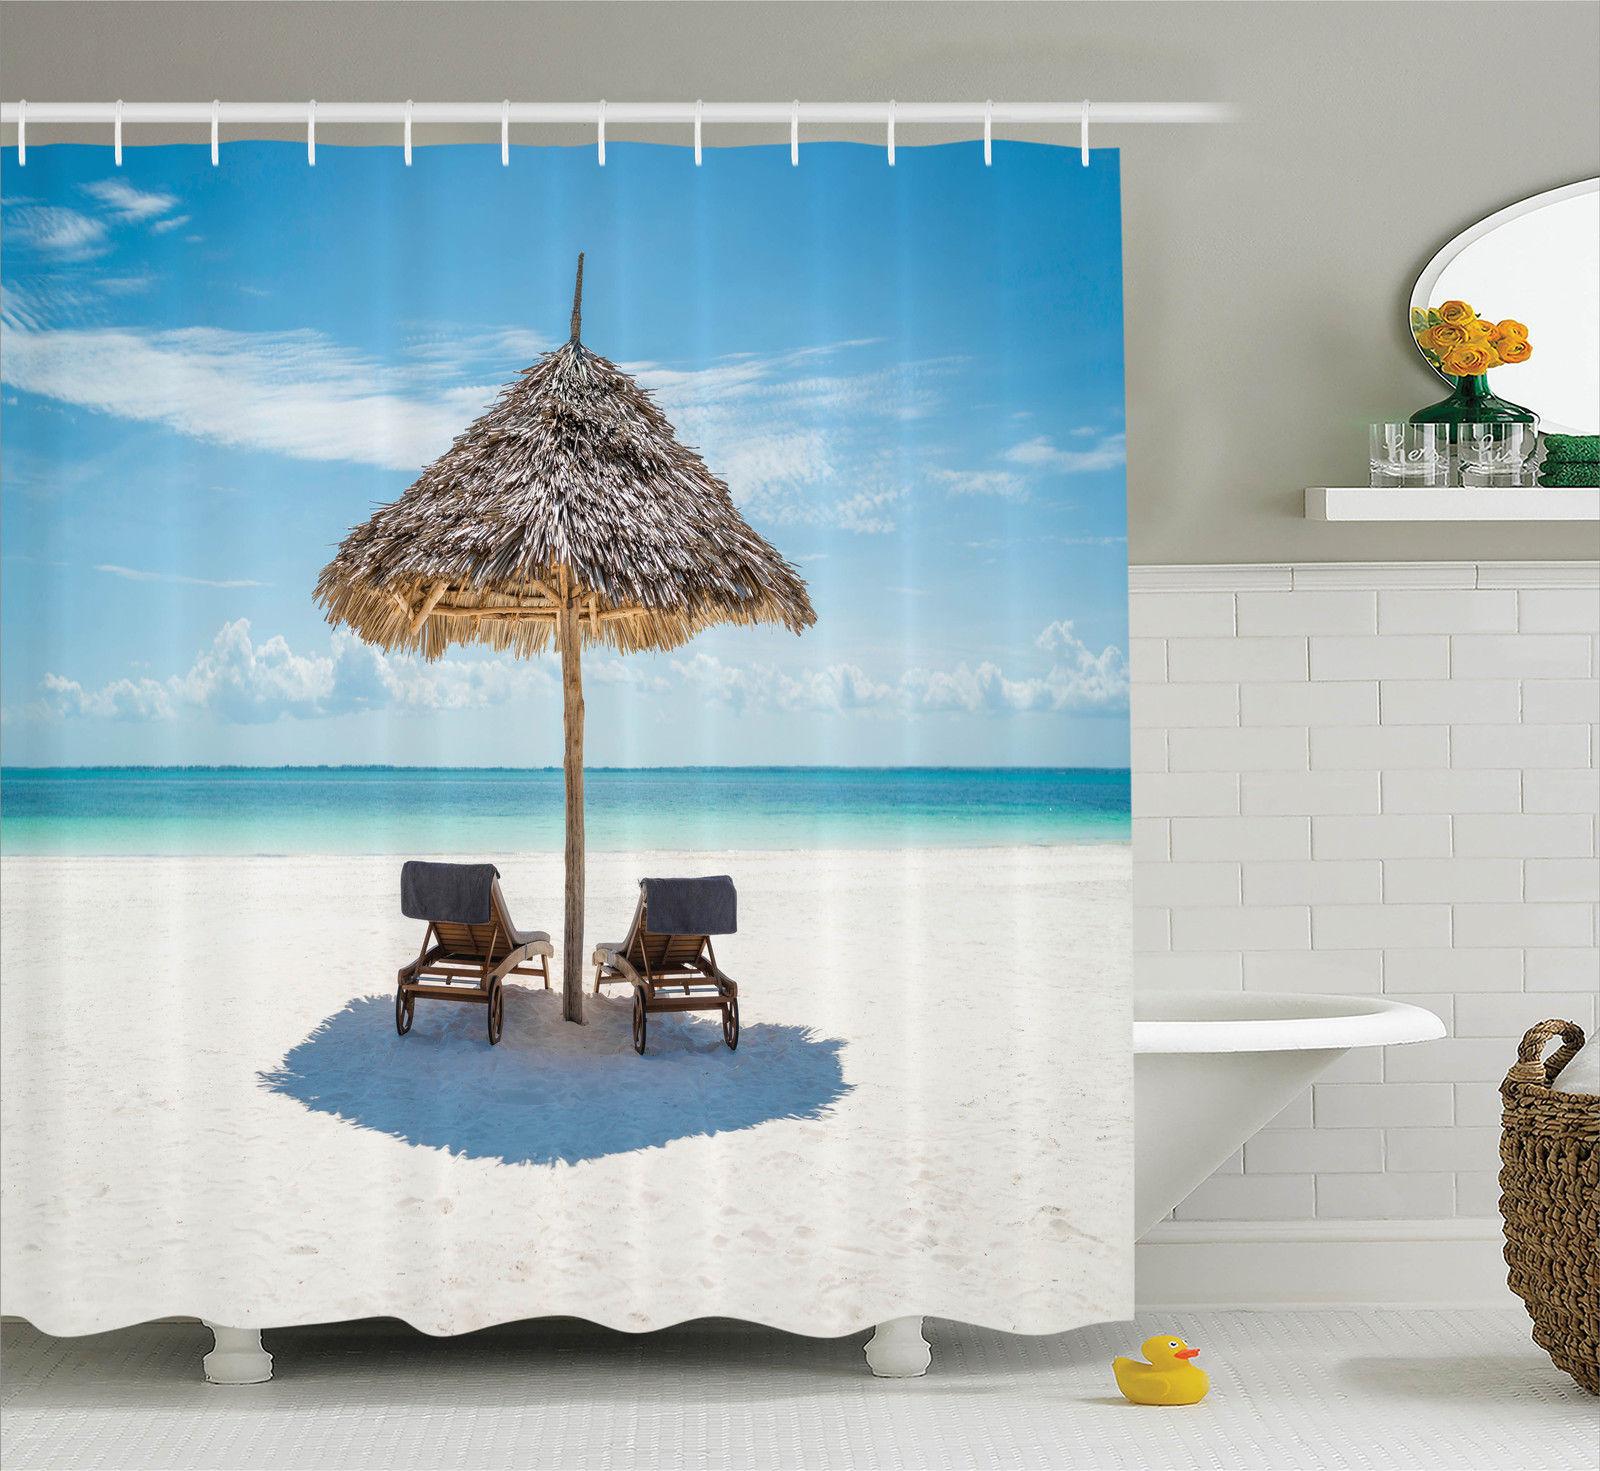 Seaside Decor  Wooden Sun Loungers Facing The Indian Ocea...